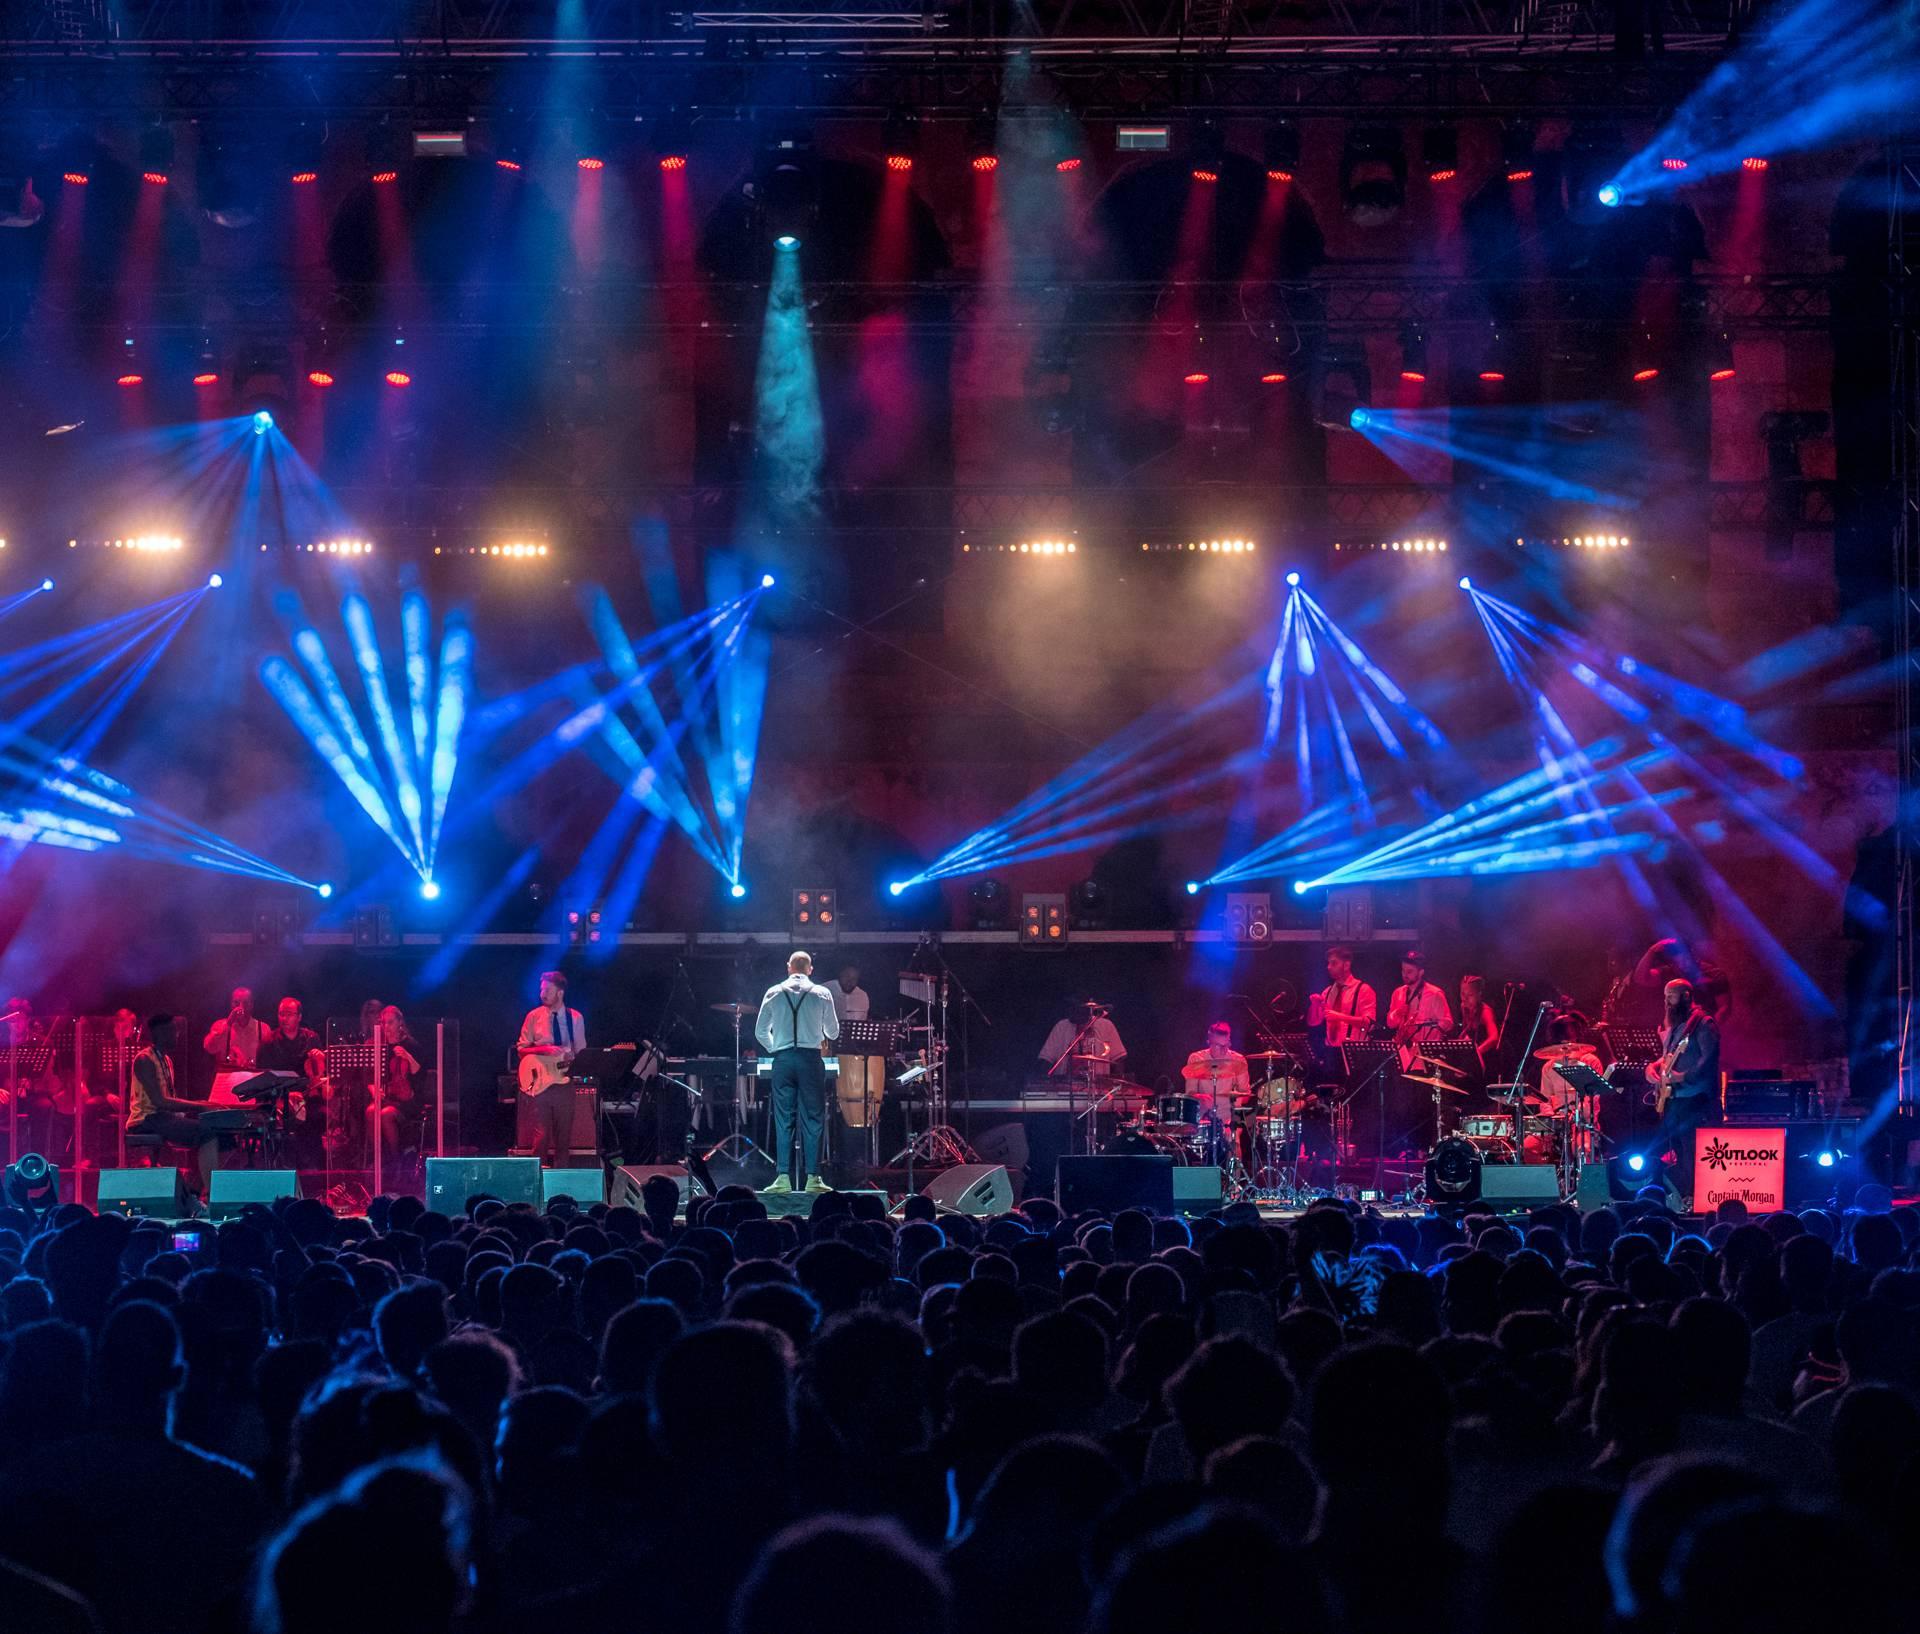 Outlook - najveći europski festival bass glazbe